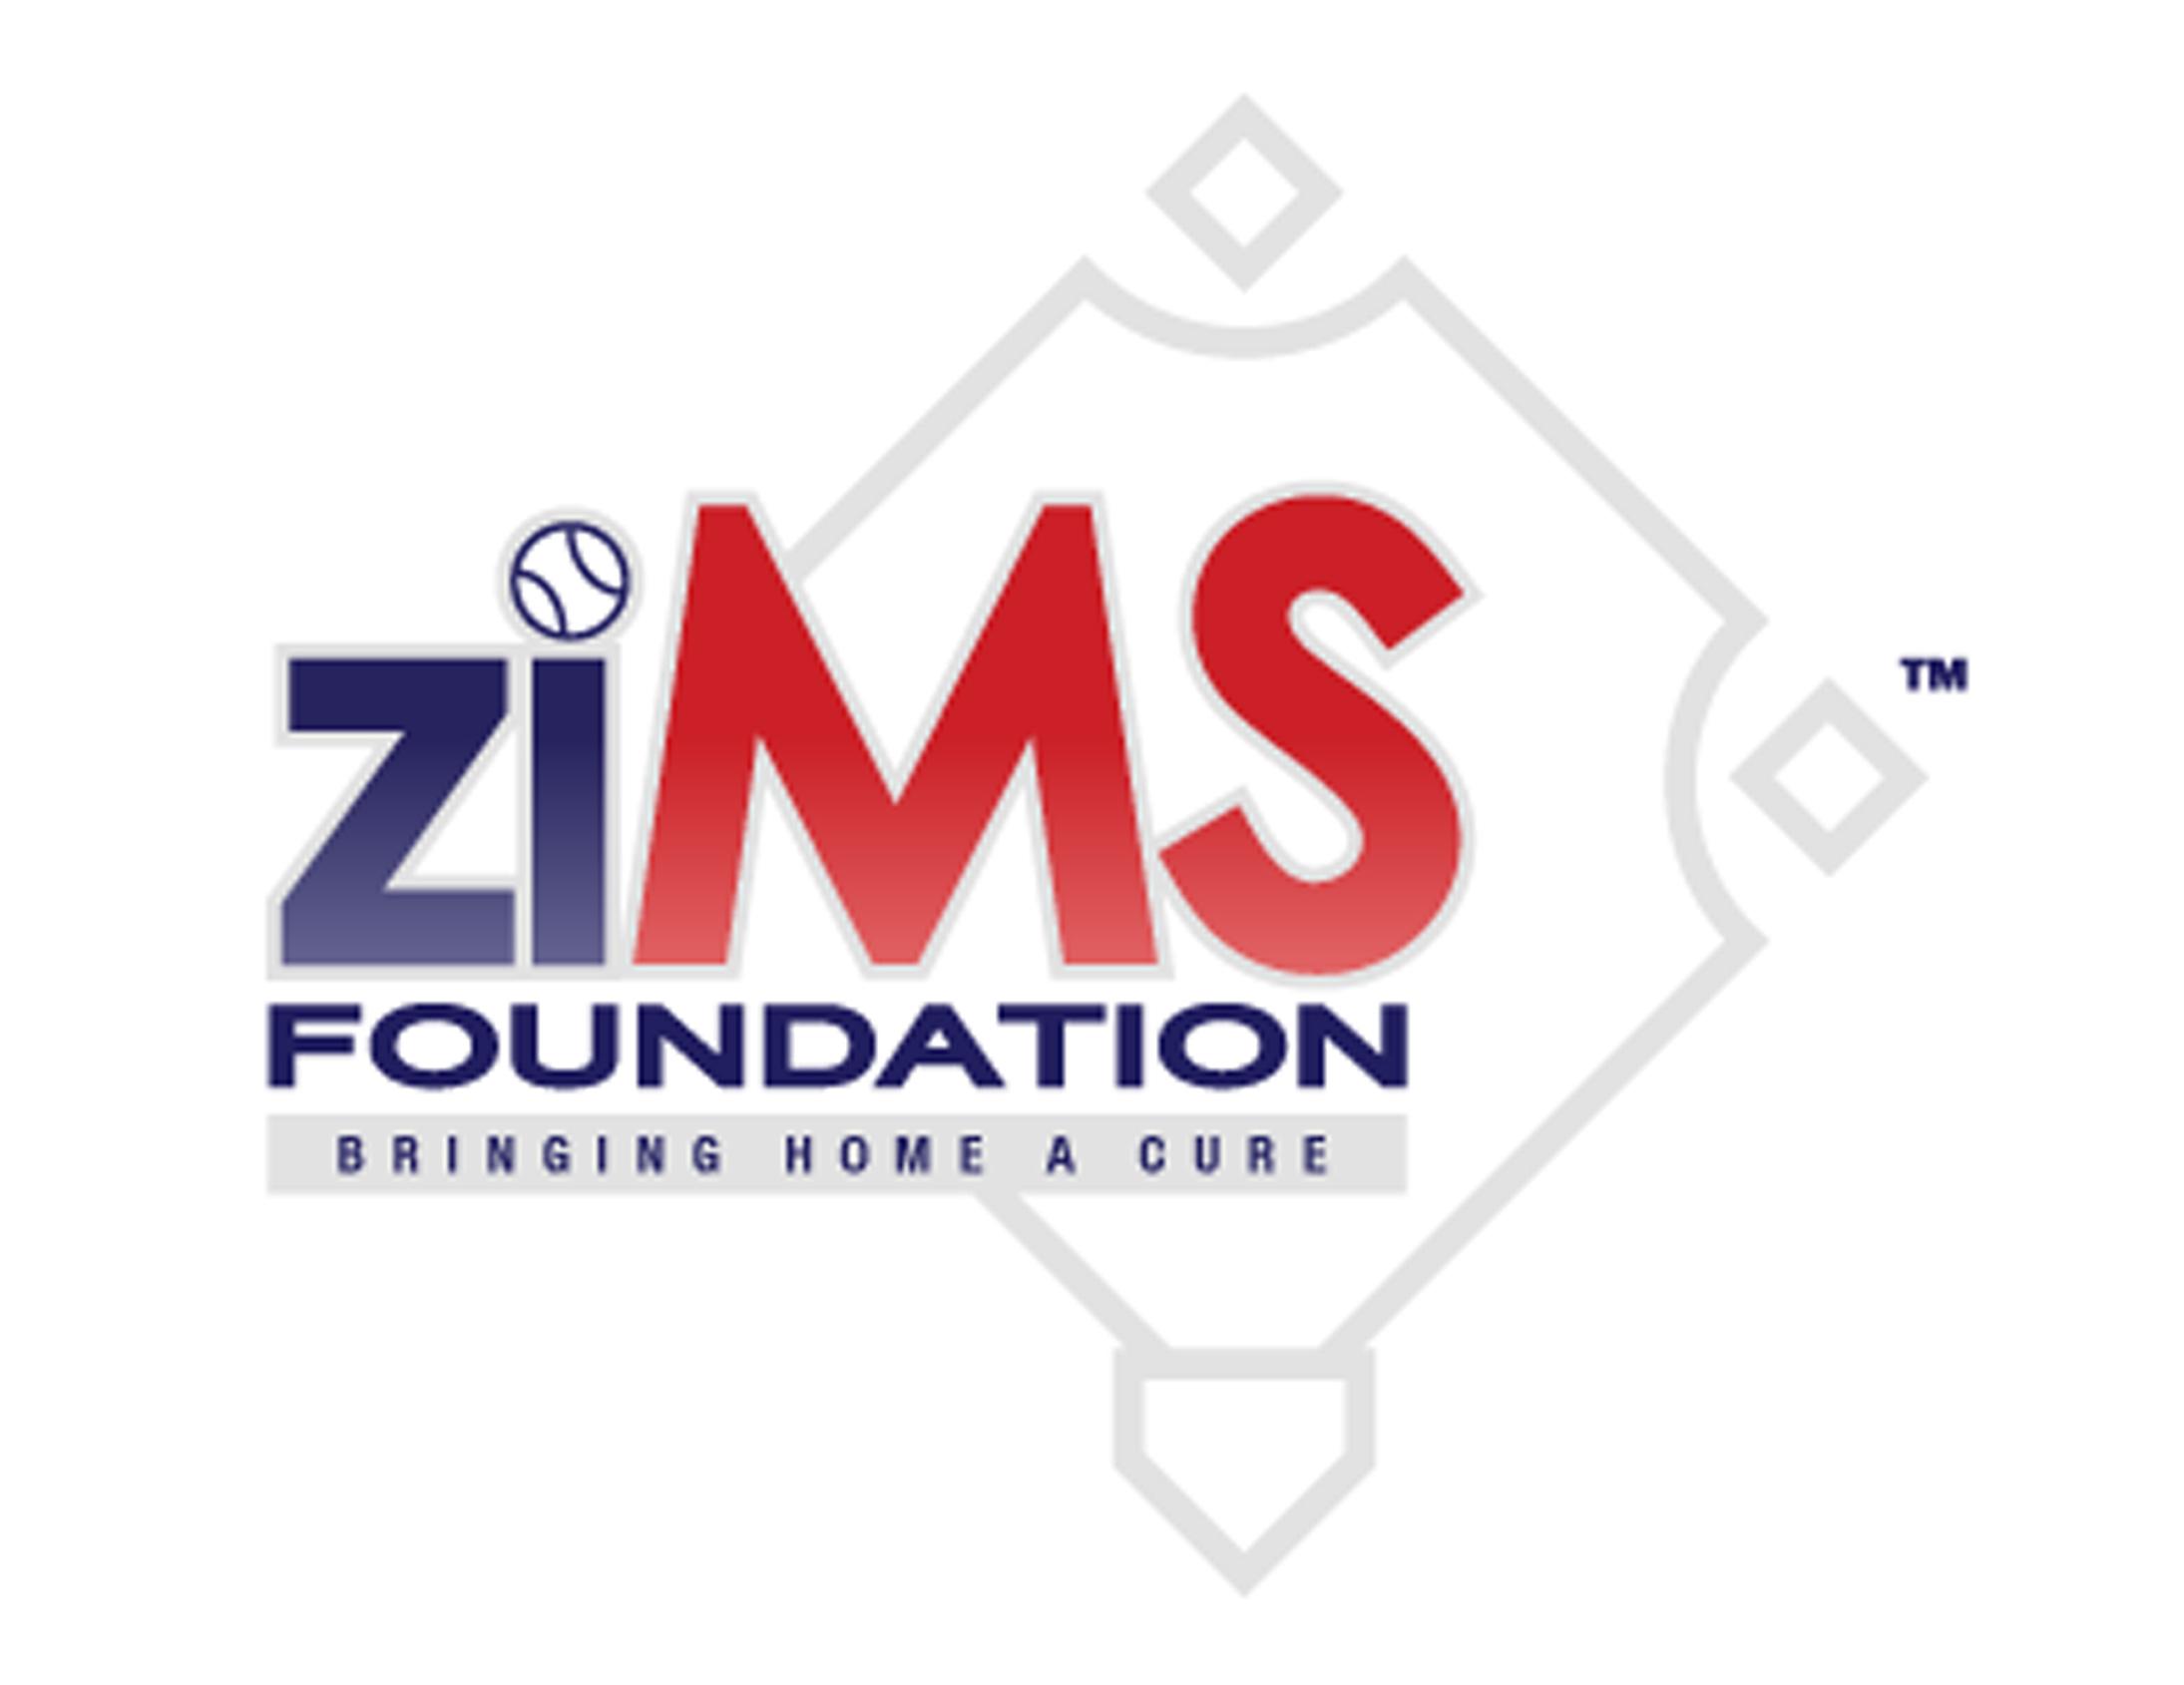 ziMS logo